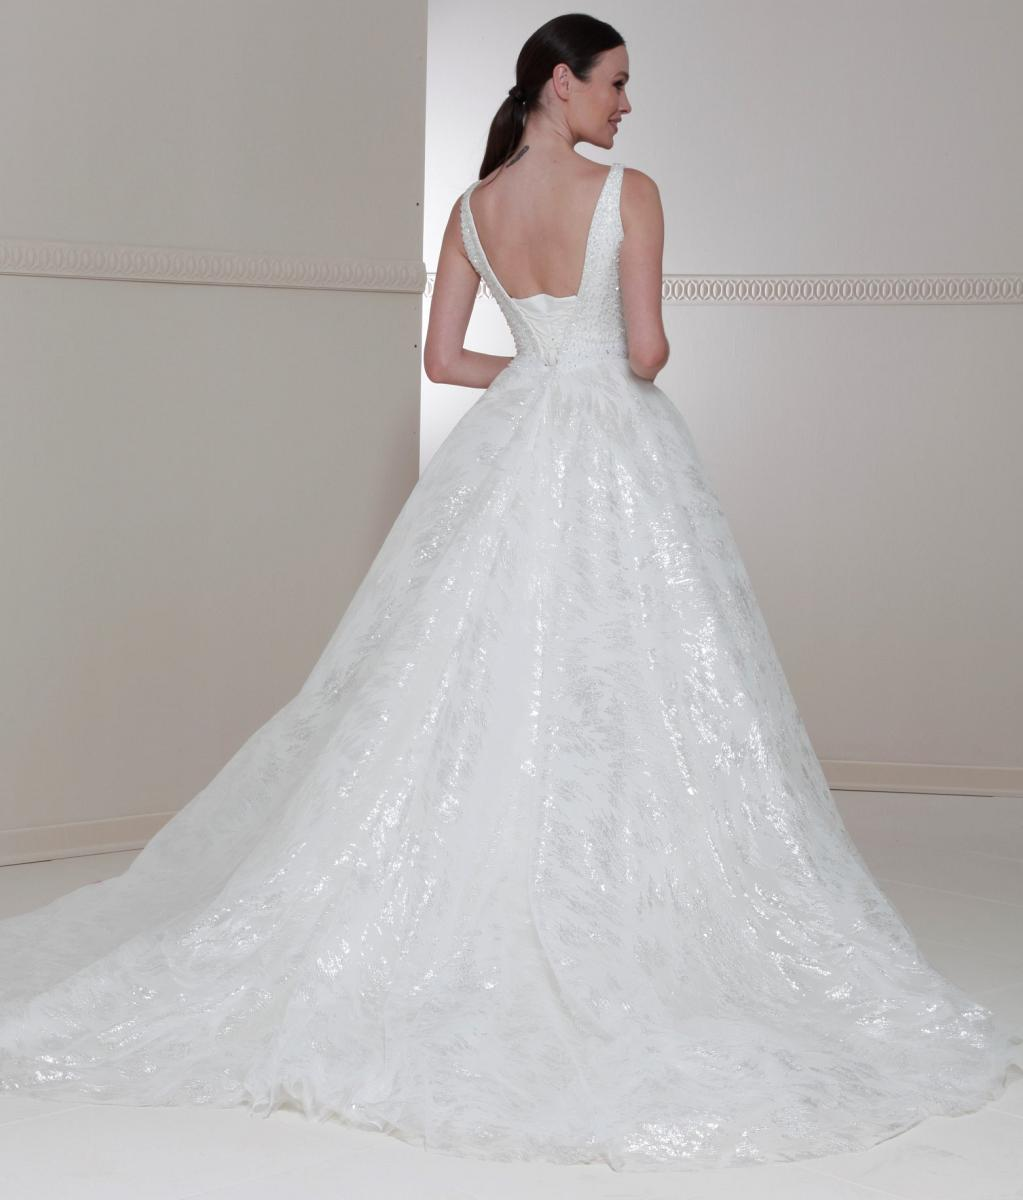 celli-spose-sposa-2022_CRYSTALLINE-BRIDALS-2841-3